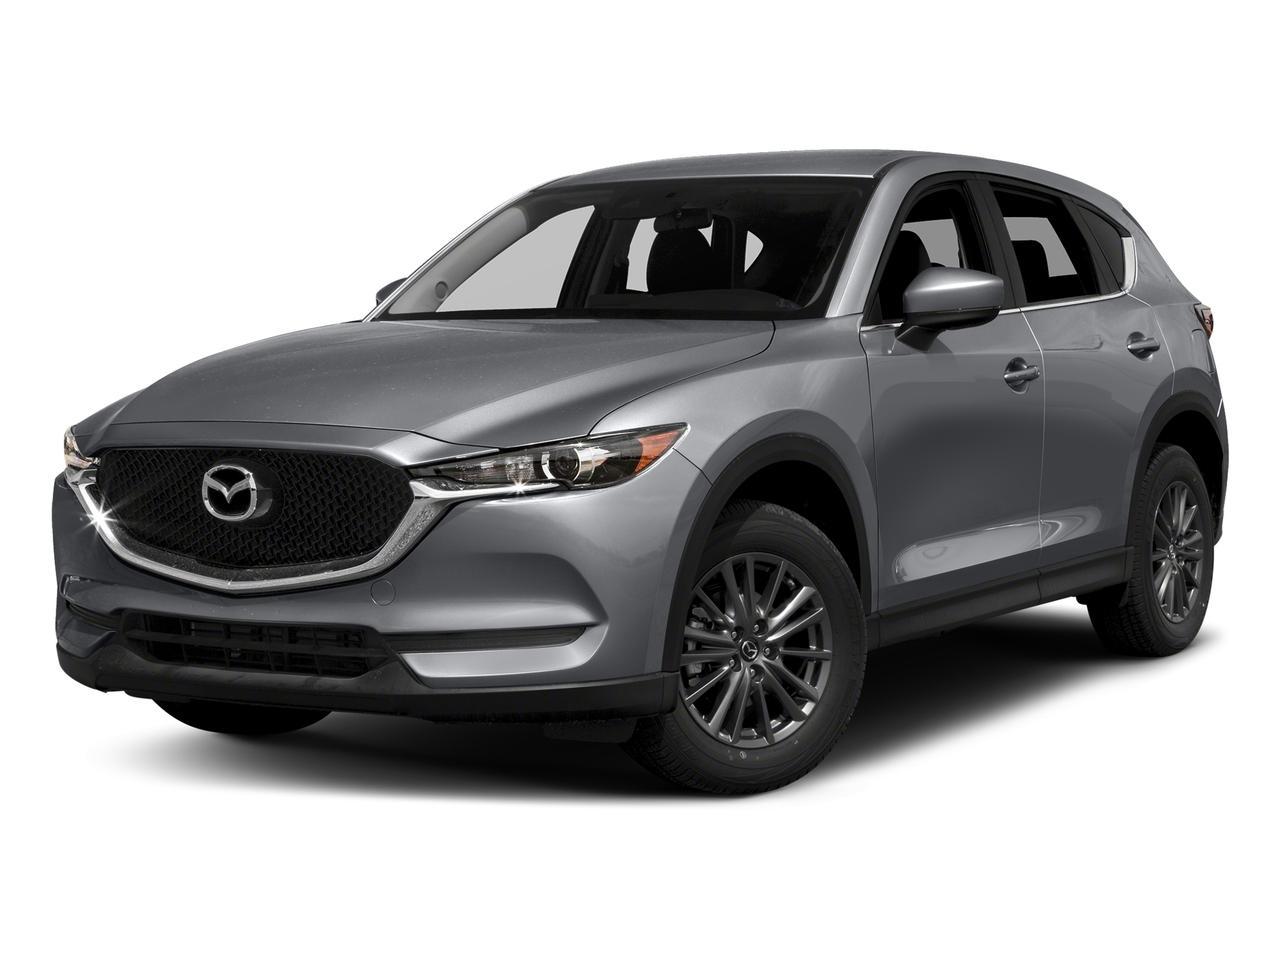 2017 Mazda CX-5 Vehicle Photo in Portland, OR 97225